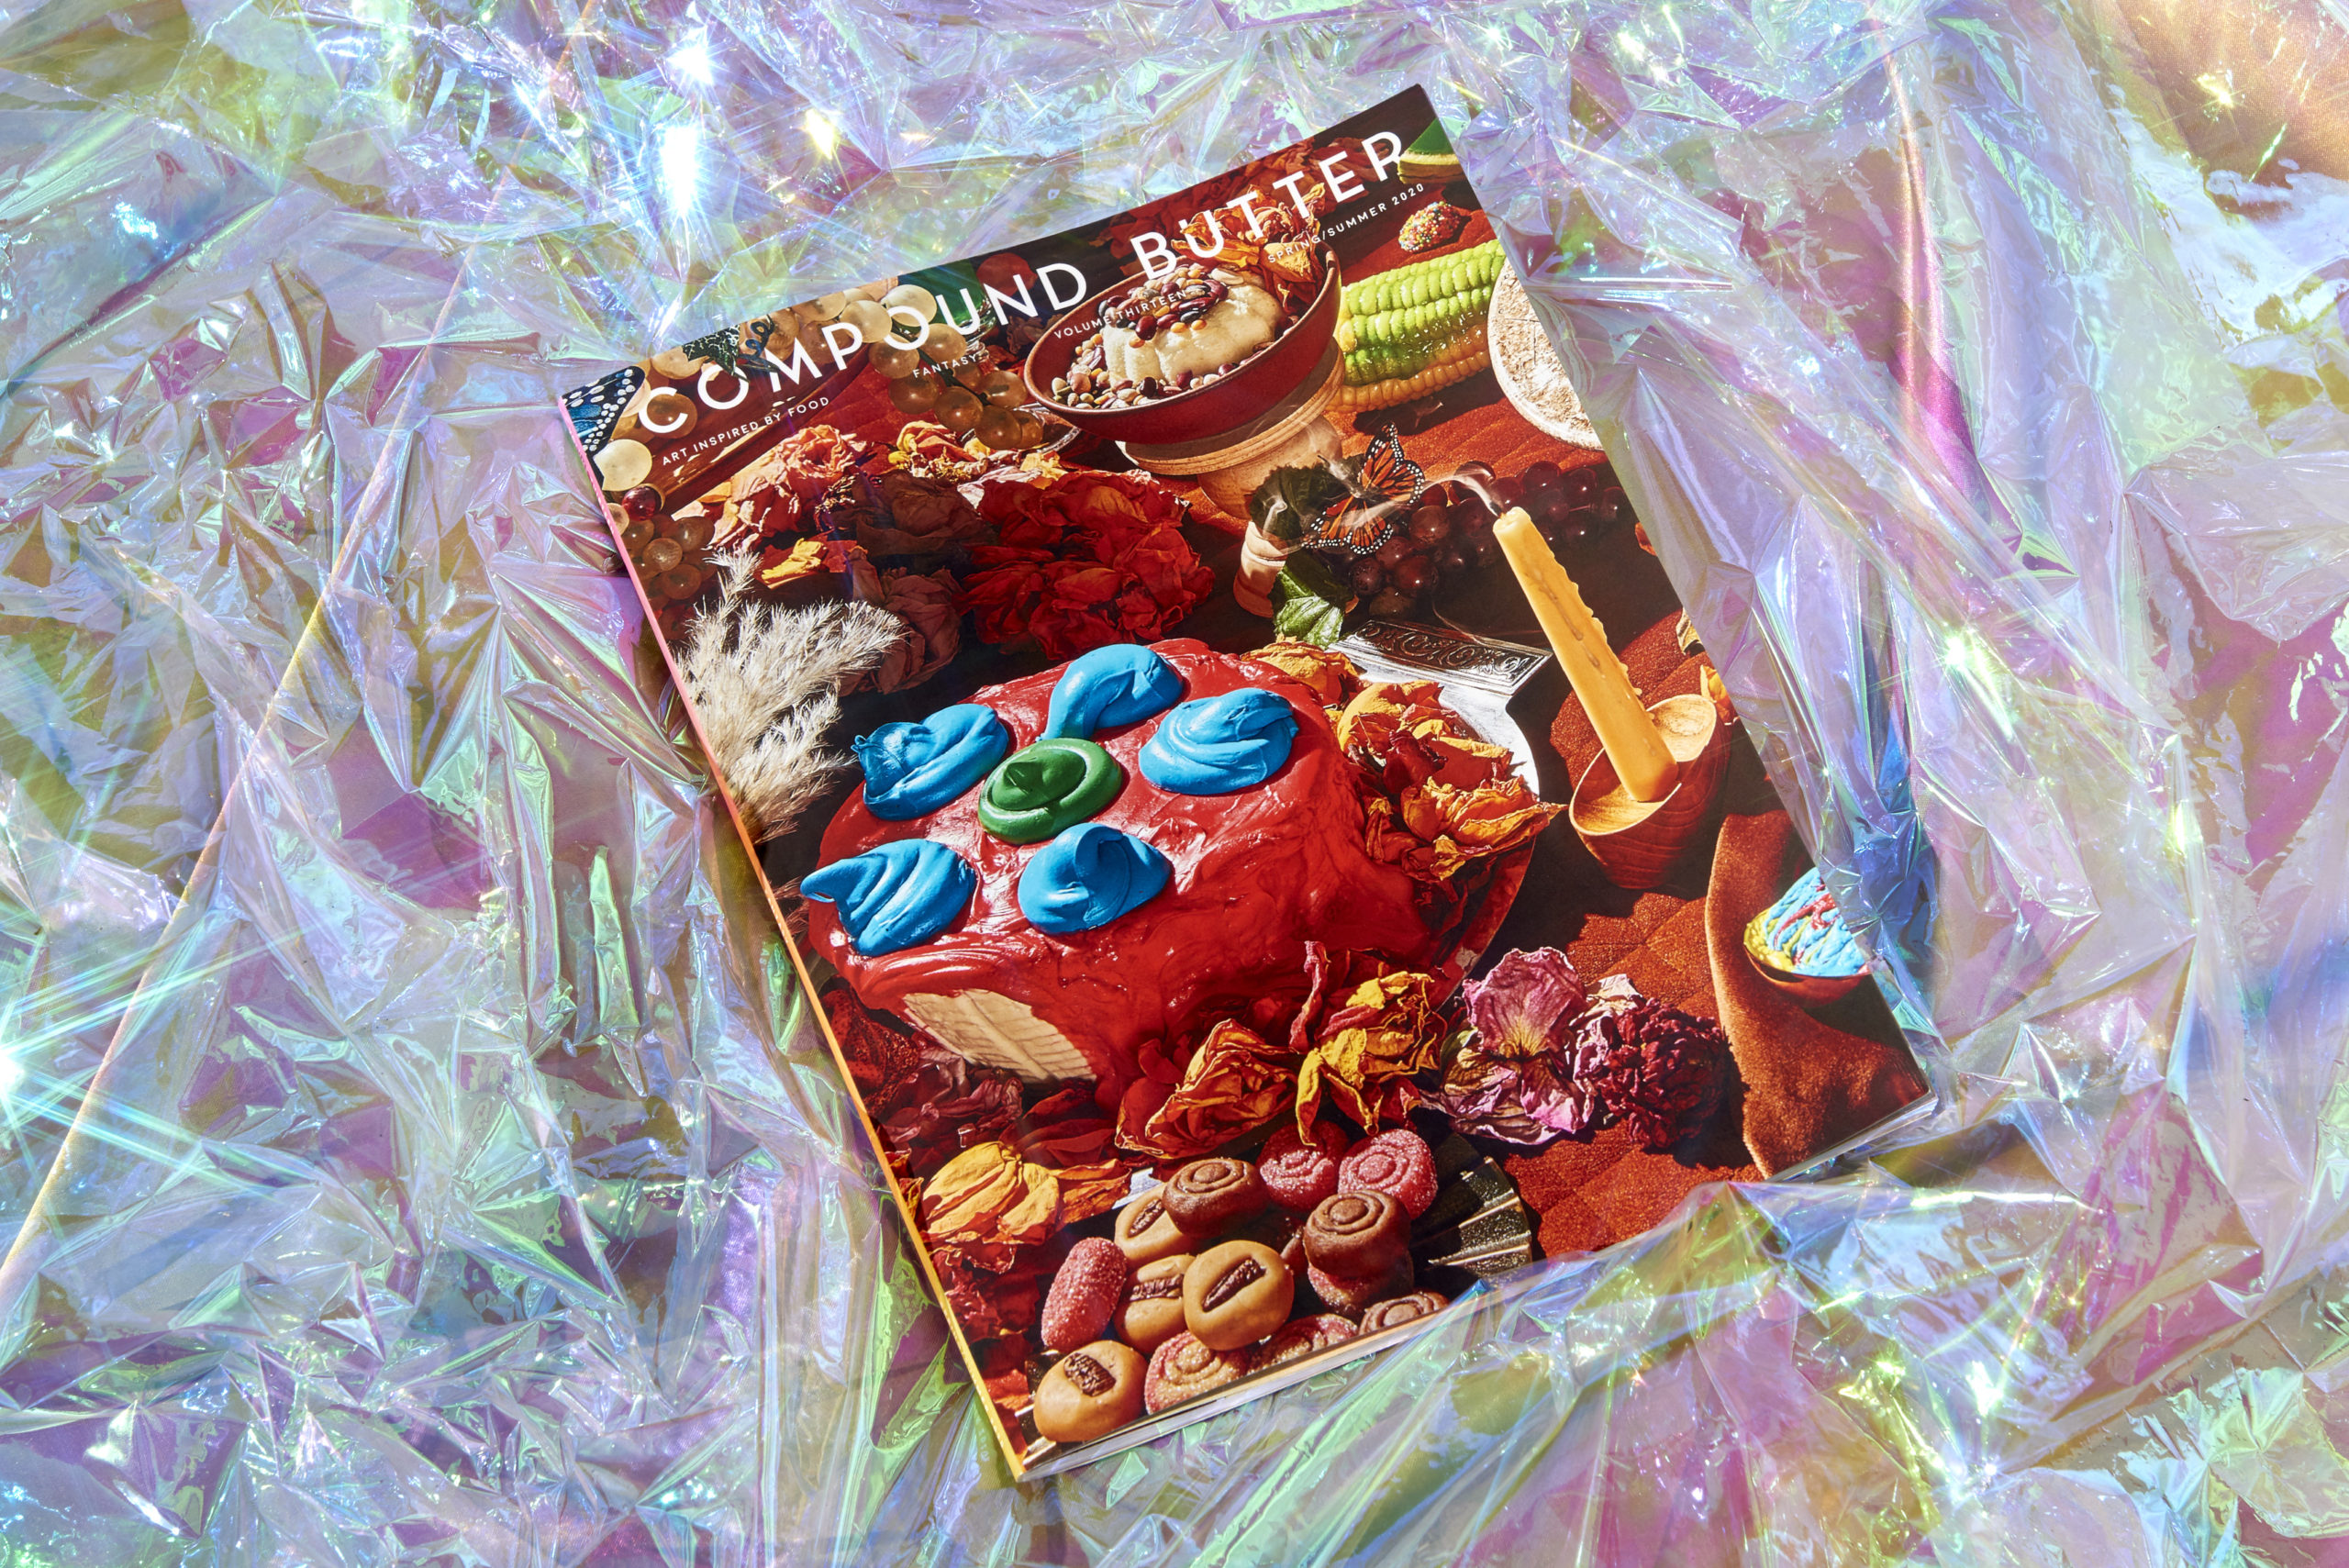 Yasara Gunawardena – Compound Butter Fantasy Issue – H